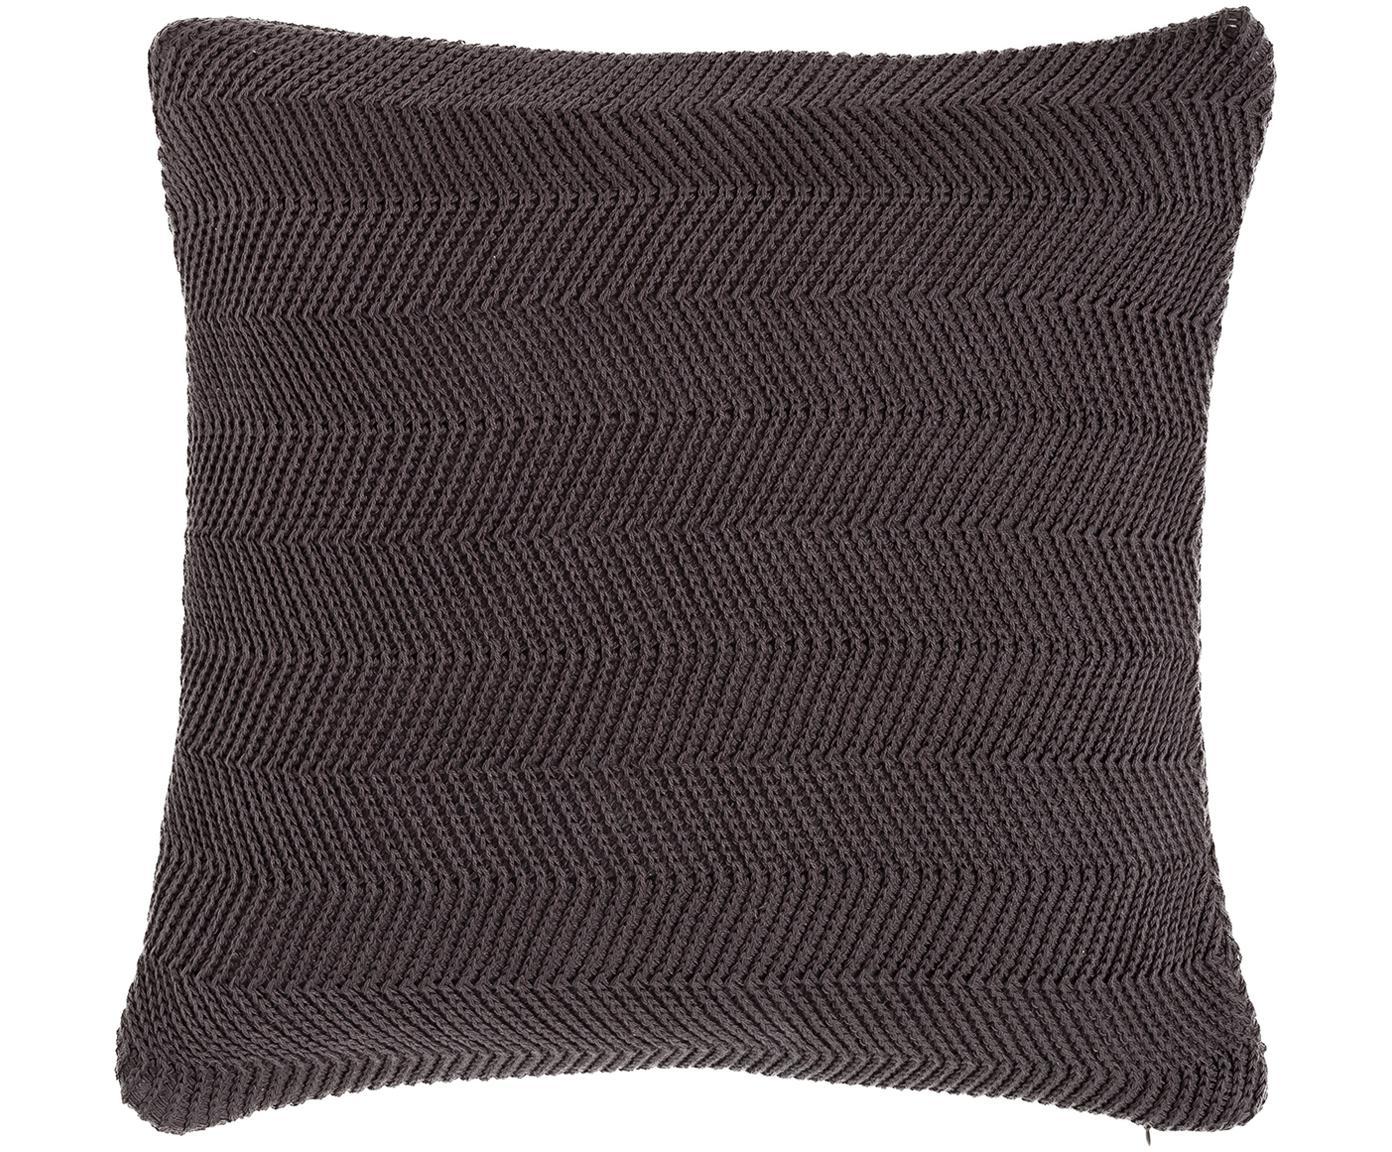 Federa arredo in cucitura a maglia Leila, 100% cotone, Grigio, P 40 x L 40 cm